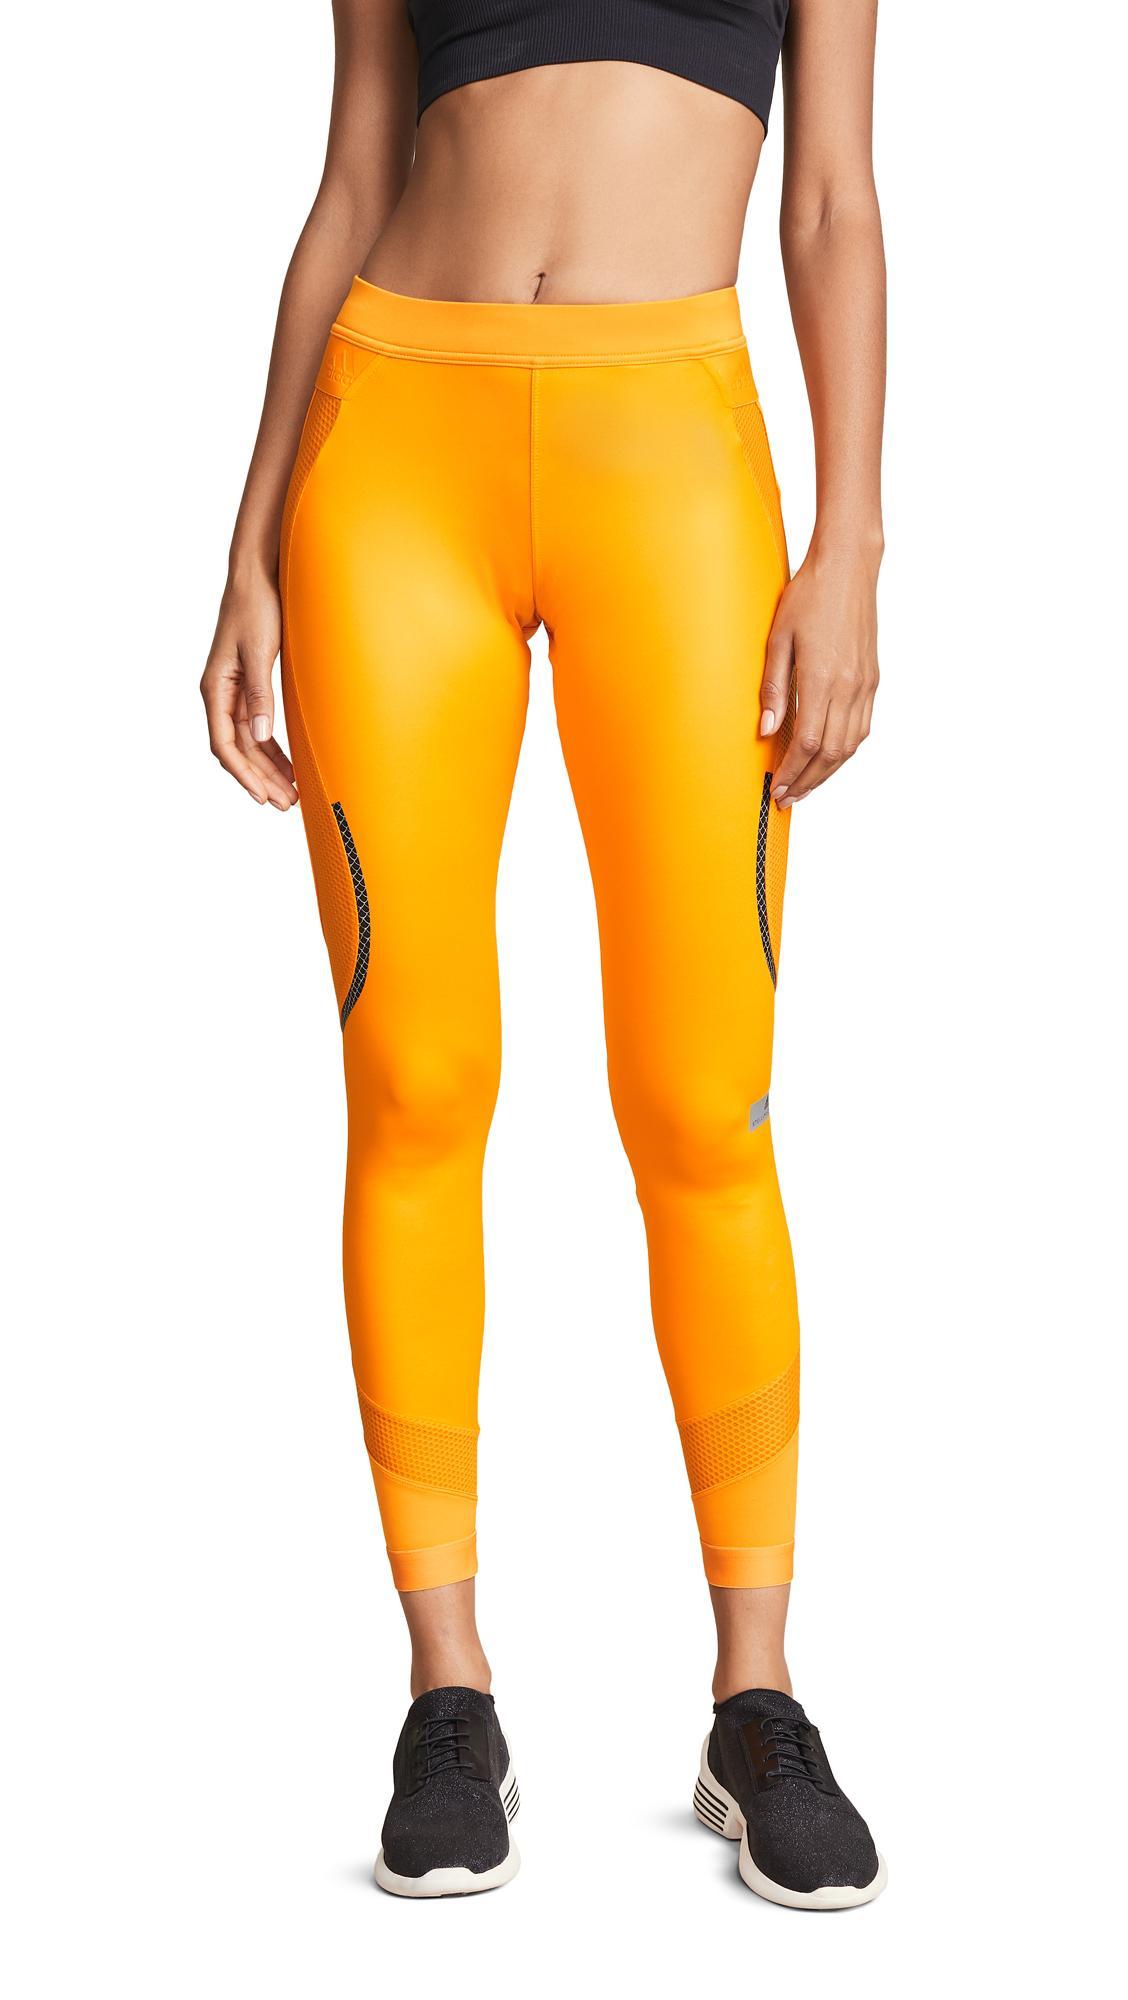 Adidas By Stella Mccartney Run Long Shiny Leggings In Lucky Orange